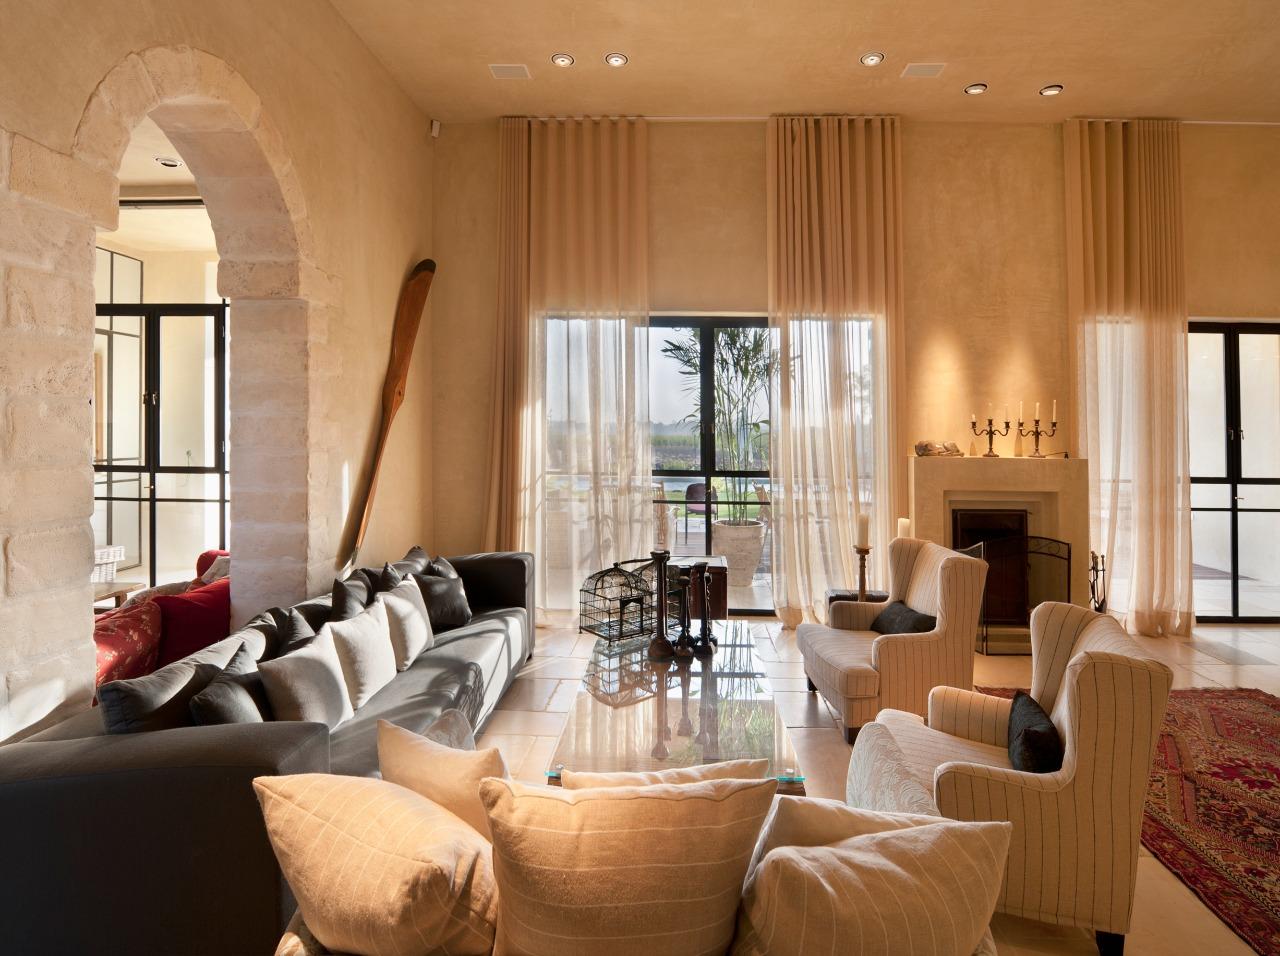 Design Ideas - The lifestyle of Delhi Living Room